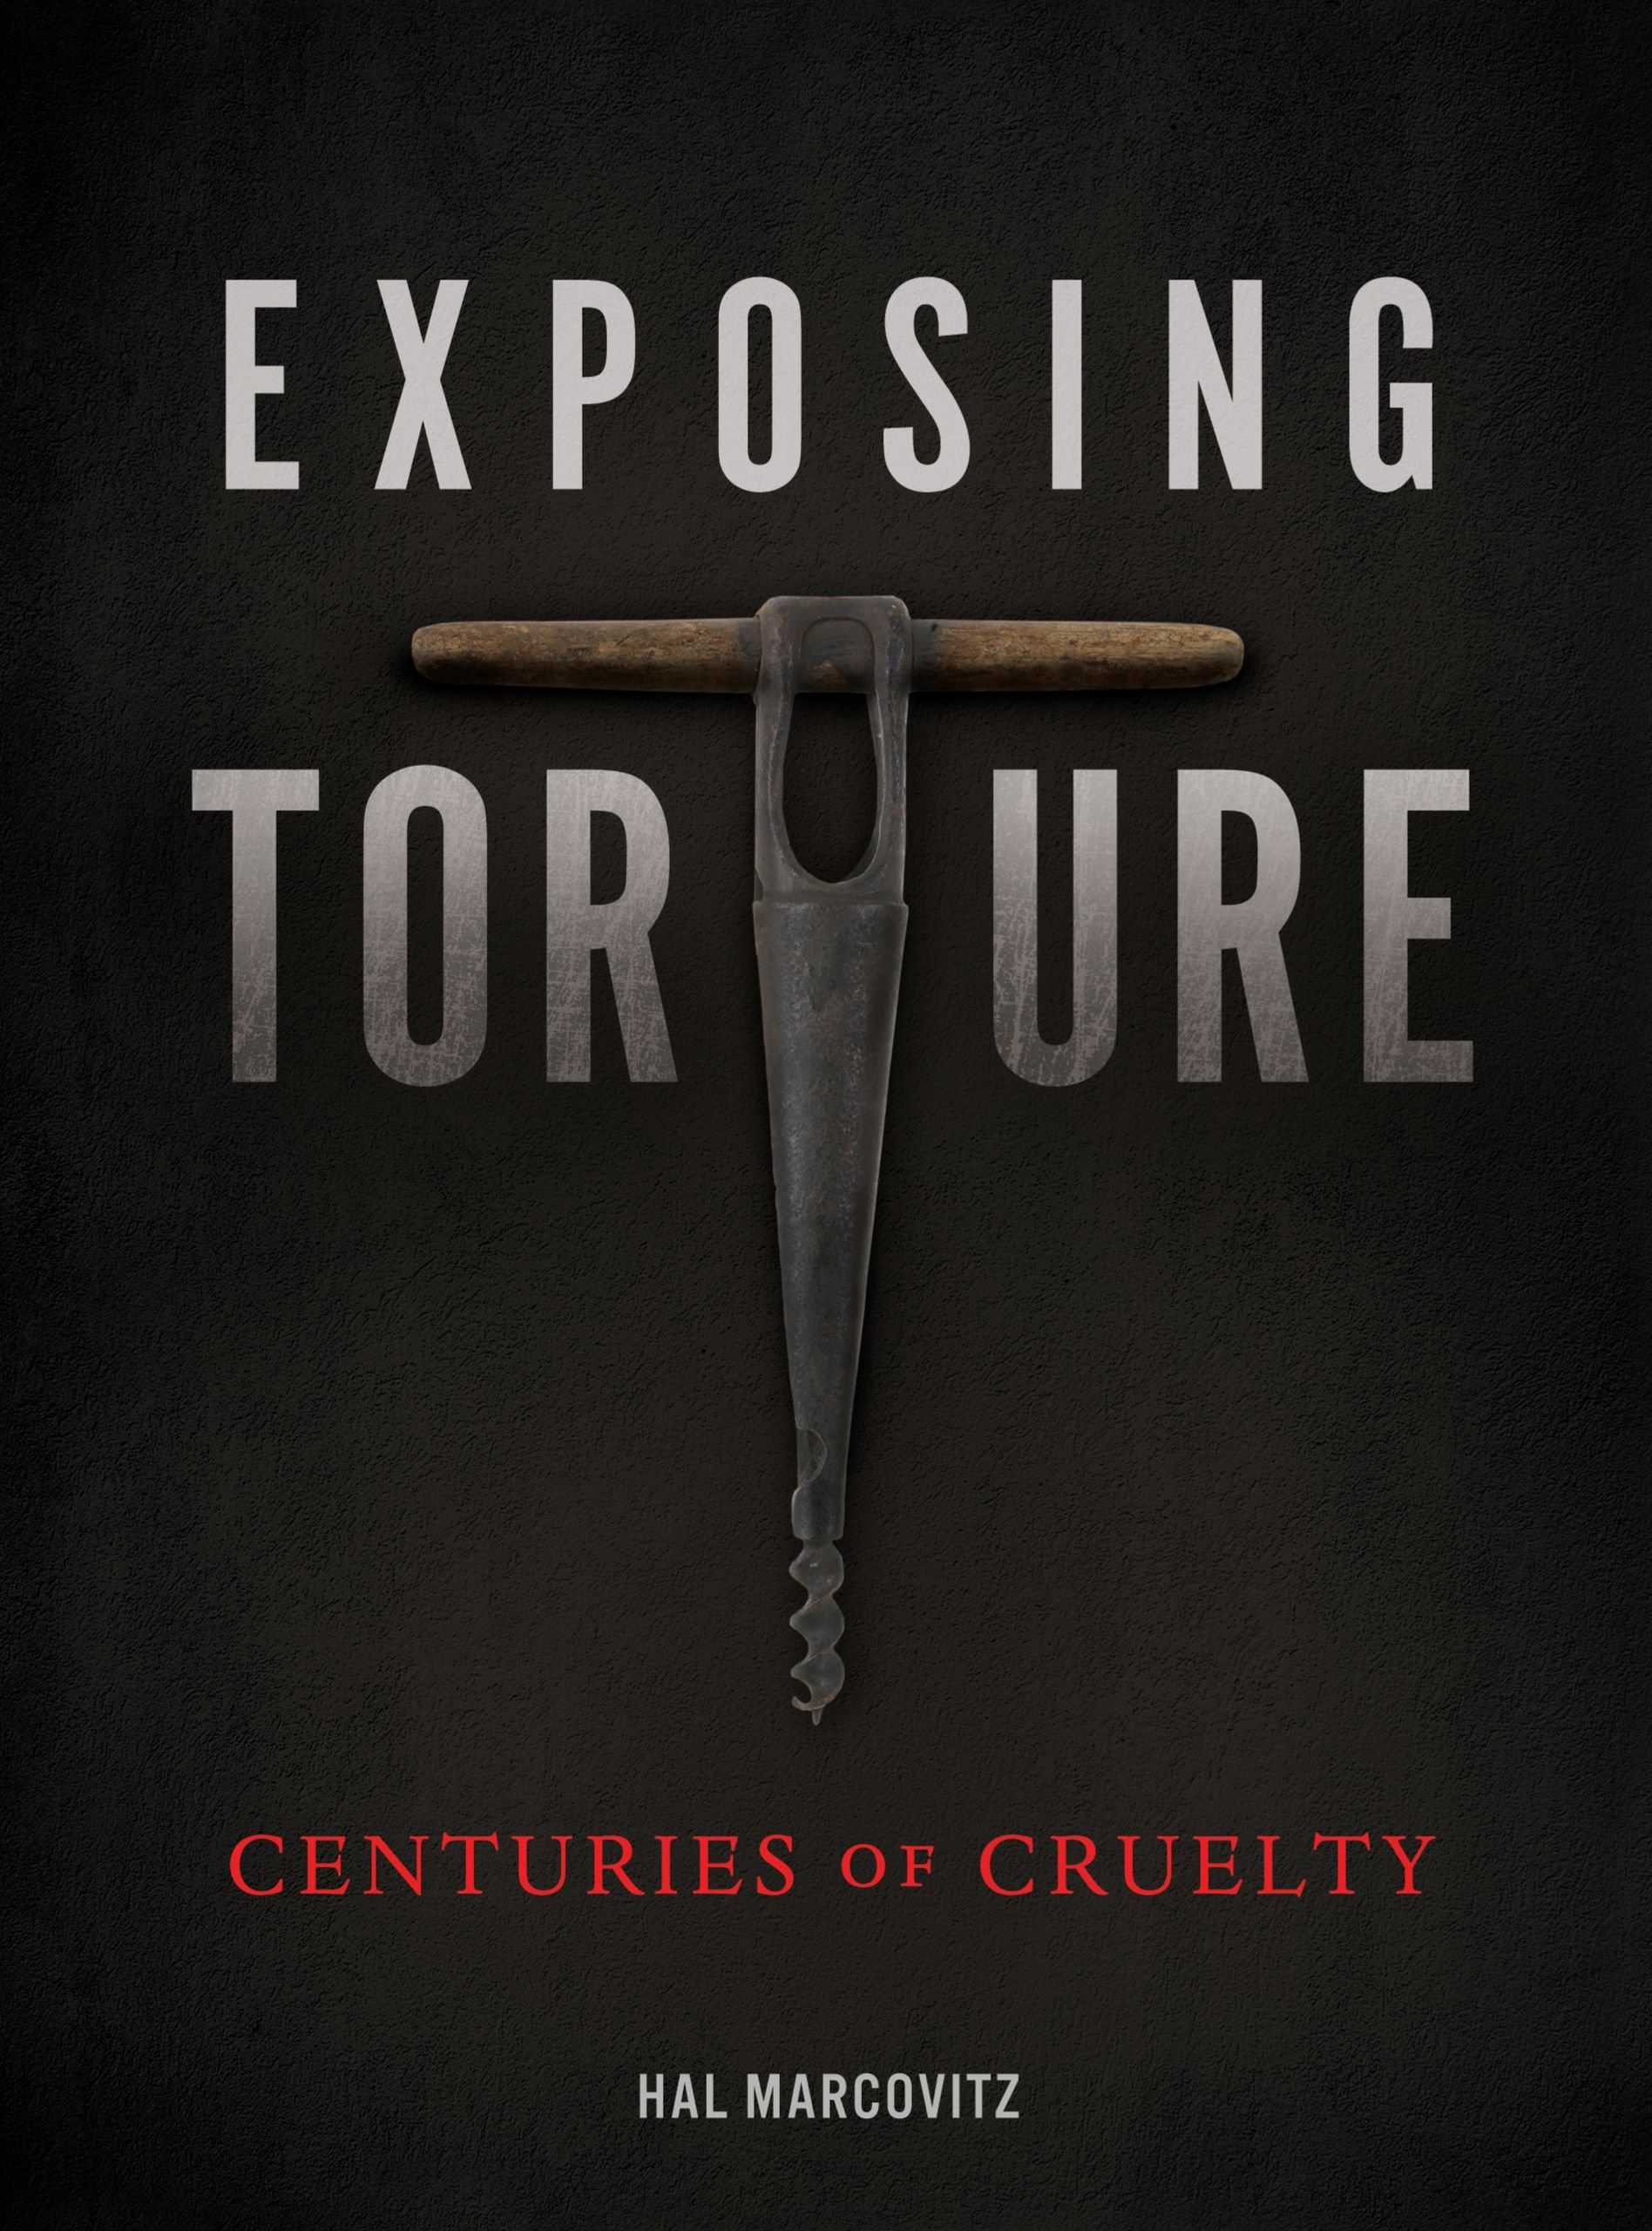 Download Exposing Torture: Centuries of Cruelty (Nonfiction - Young Adult) ebook